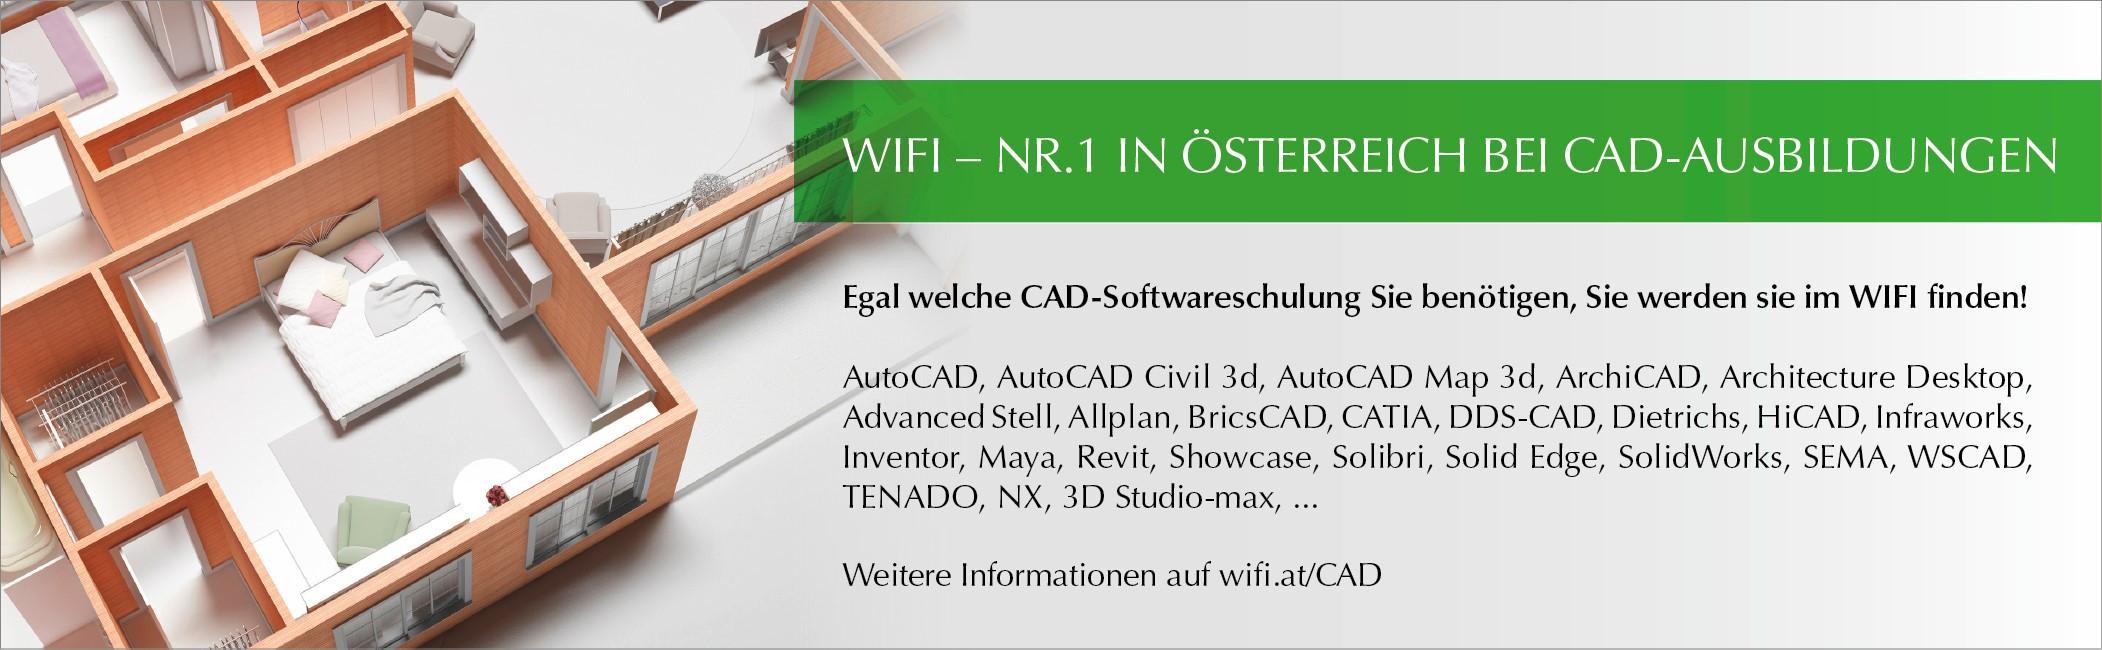 CAD Ausbildungen am WIFI OÖ